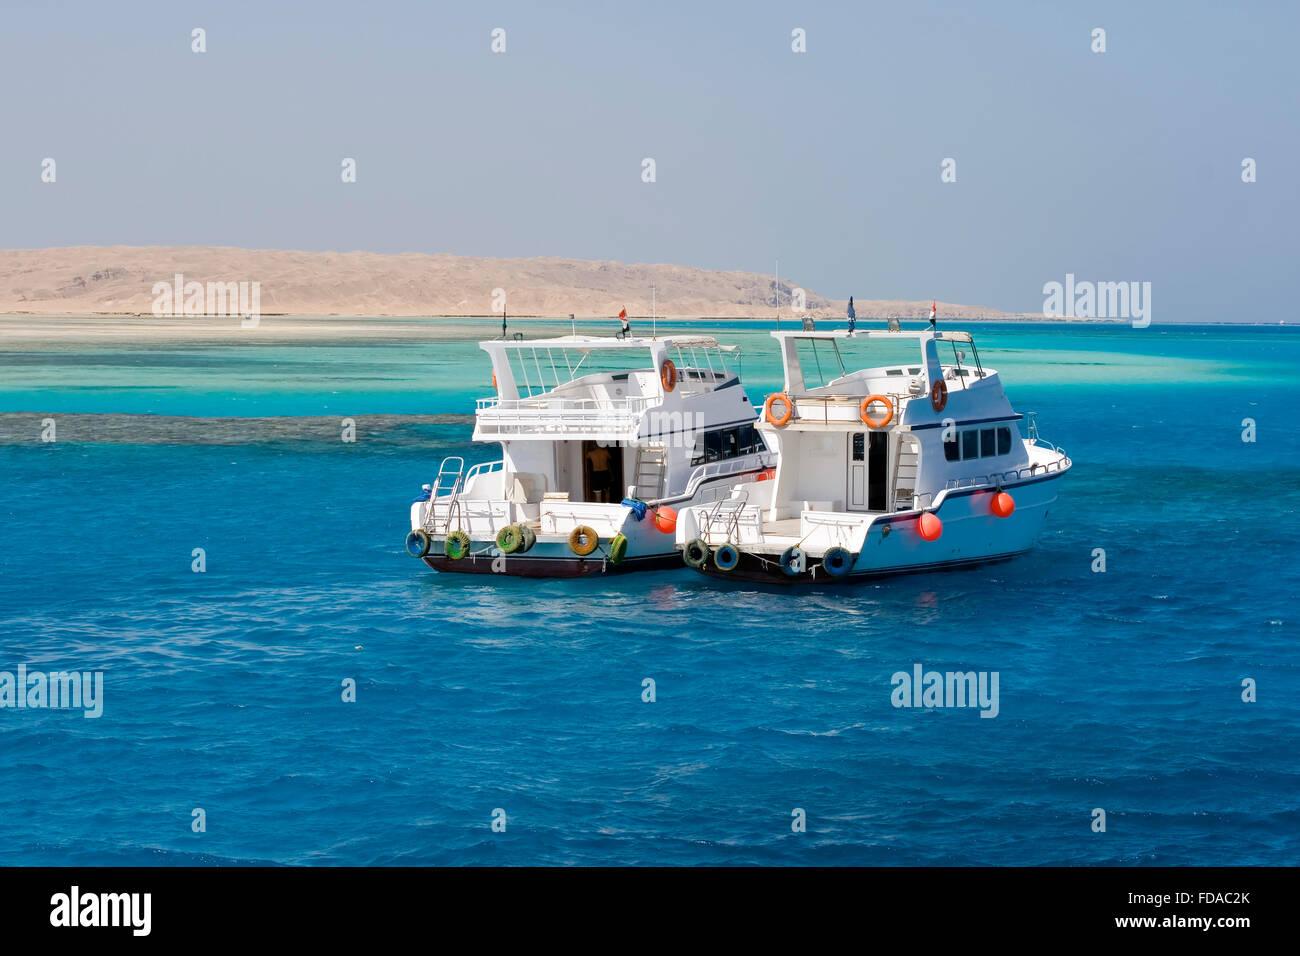 Boats anchored outside Giftin Island. Red Sea, Egypt. - Stock Image